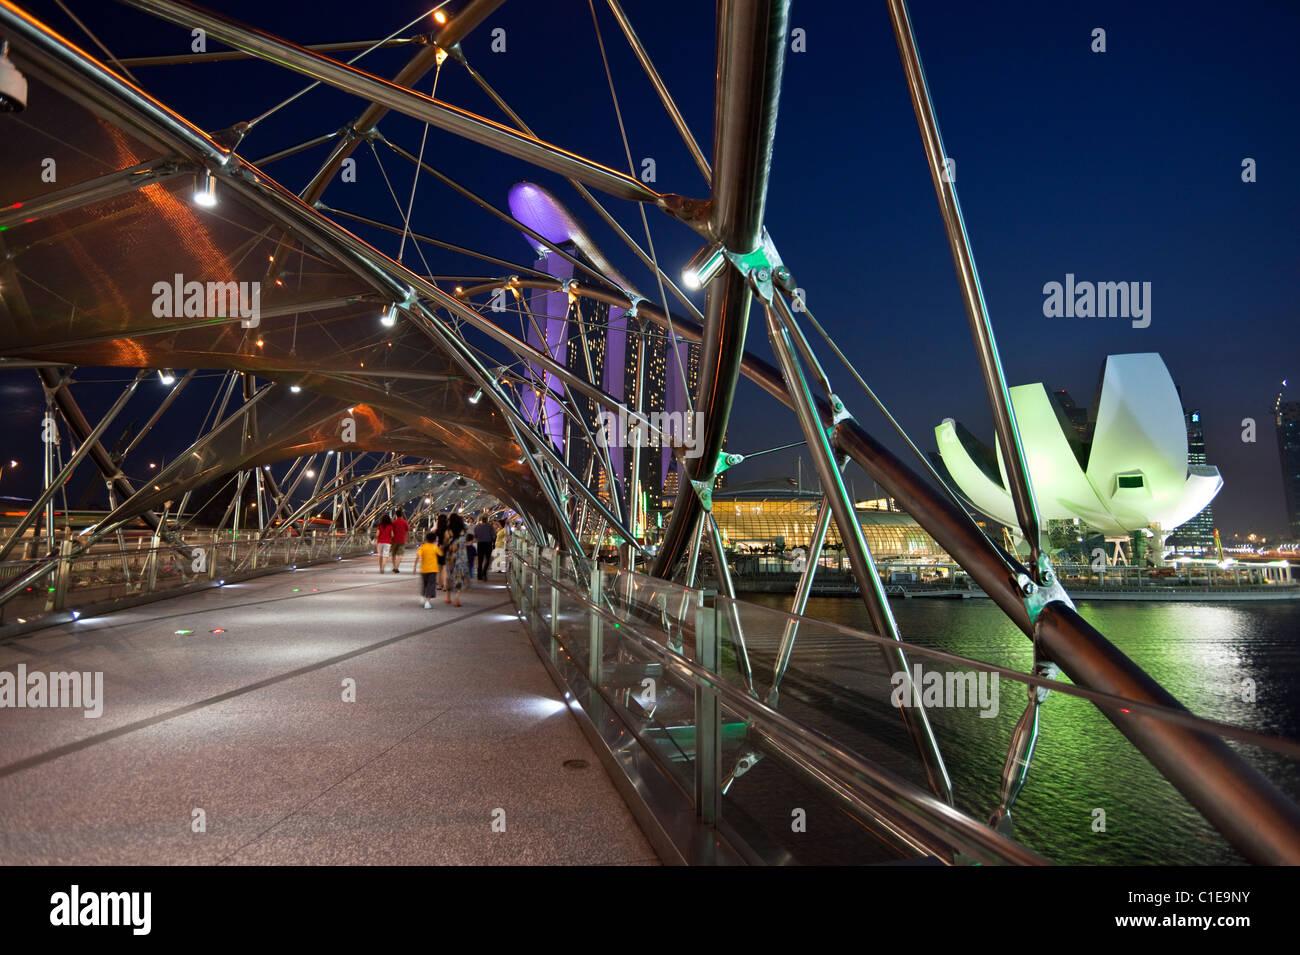 View along Helix Bridge to Marina Bay Sands Singapore.   Marina Bay, Singapore - Stock Image